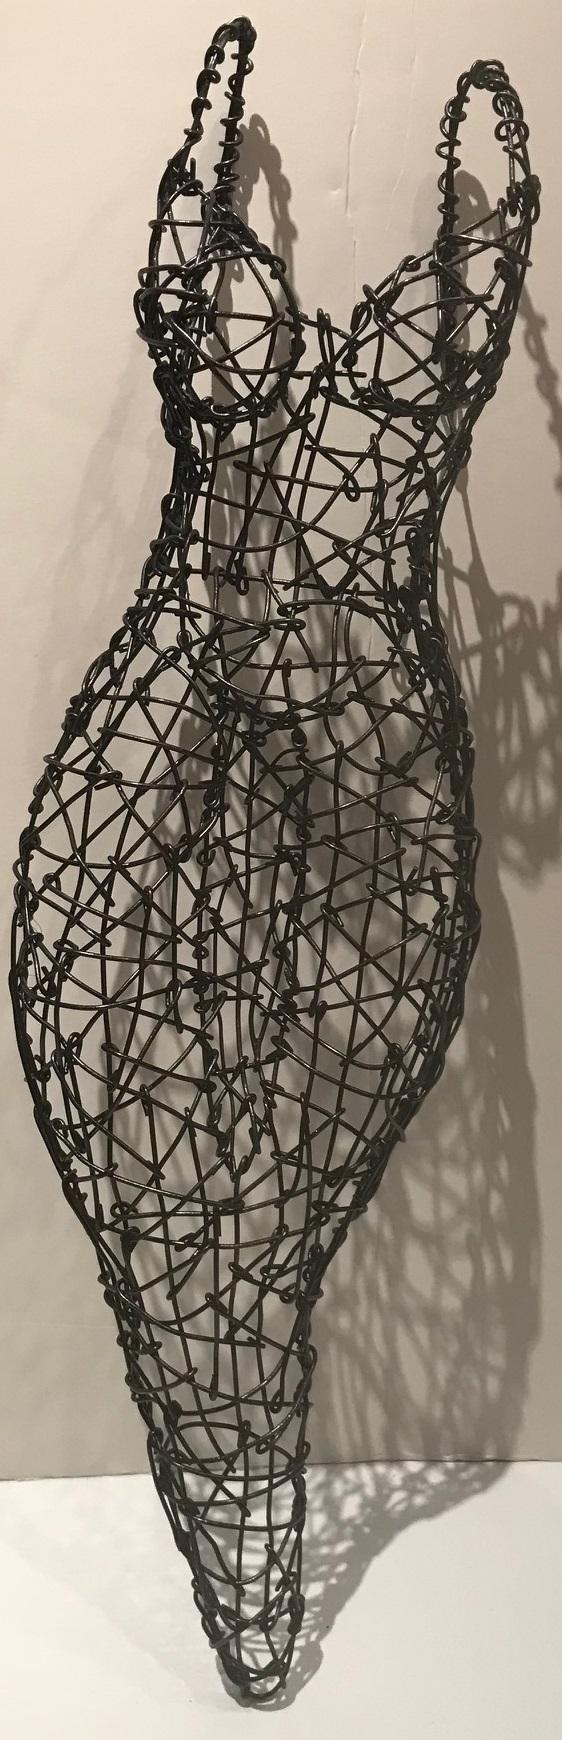 Zenith Gallery- Kristine Mays- Impermanence- 2017 -wire-21h x 5w x 3d - $600.jpg